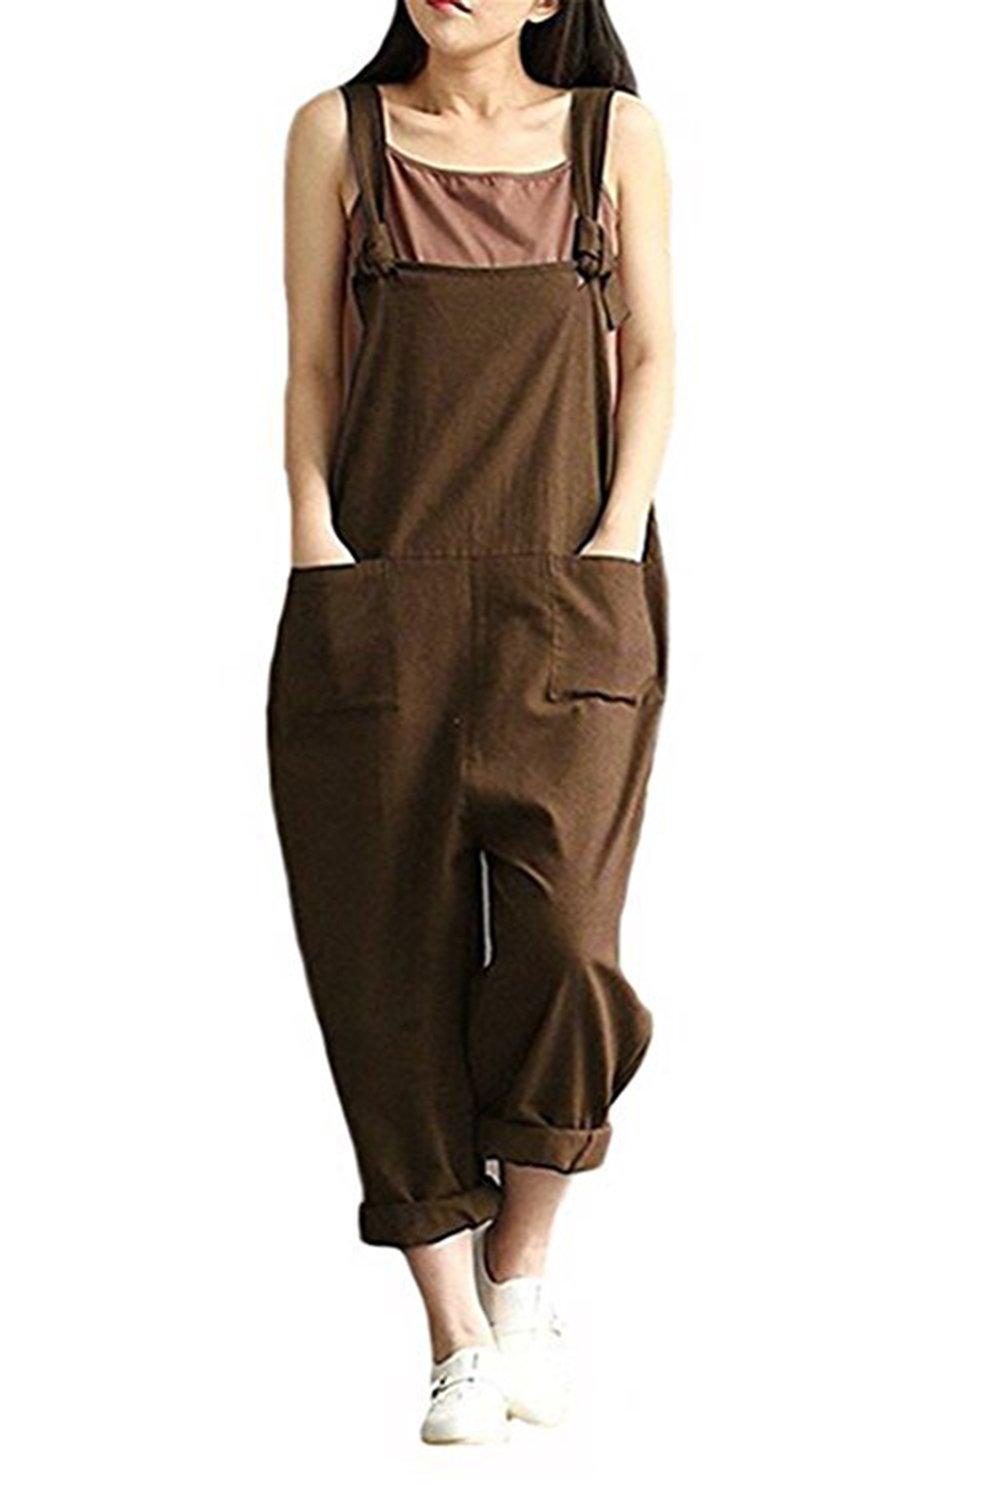 Aedvoouer Overalls for Women Casual Cotton Jumpsuit Plus Size Baggy Bib Wide Leg Overalls Pants